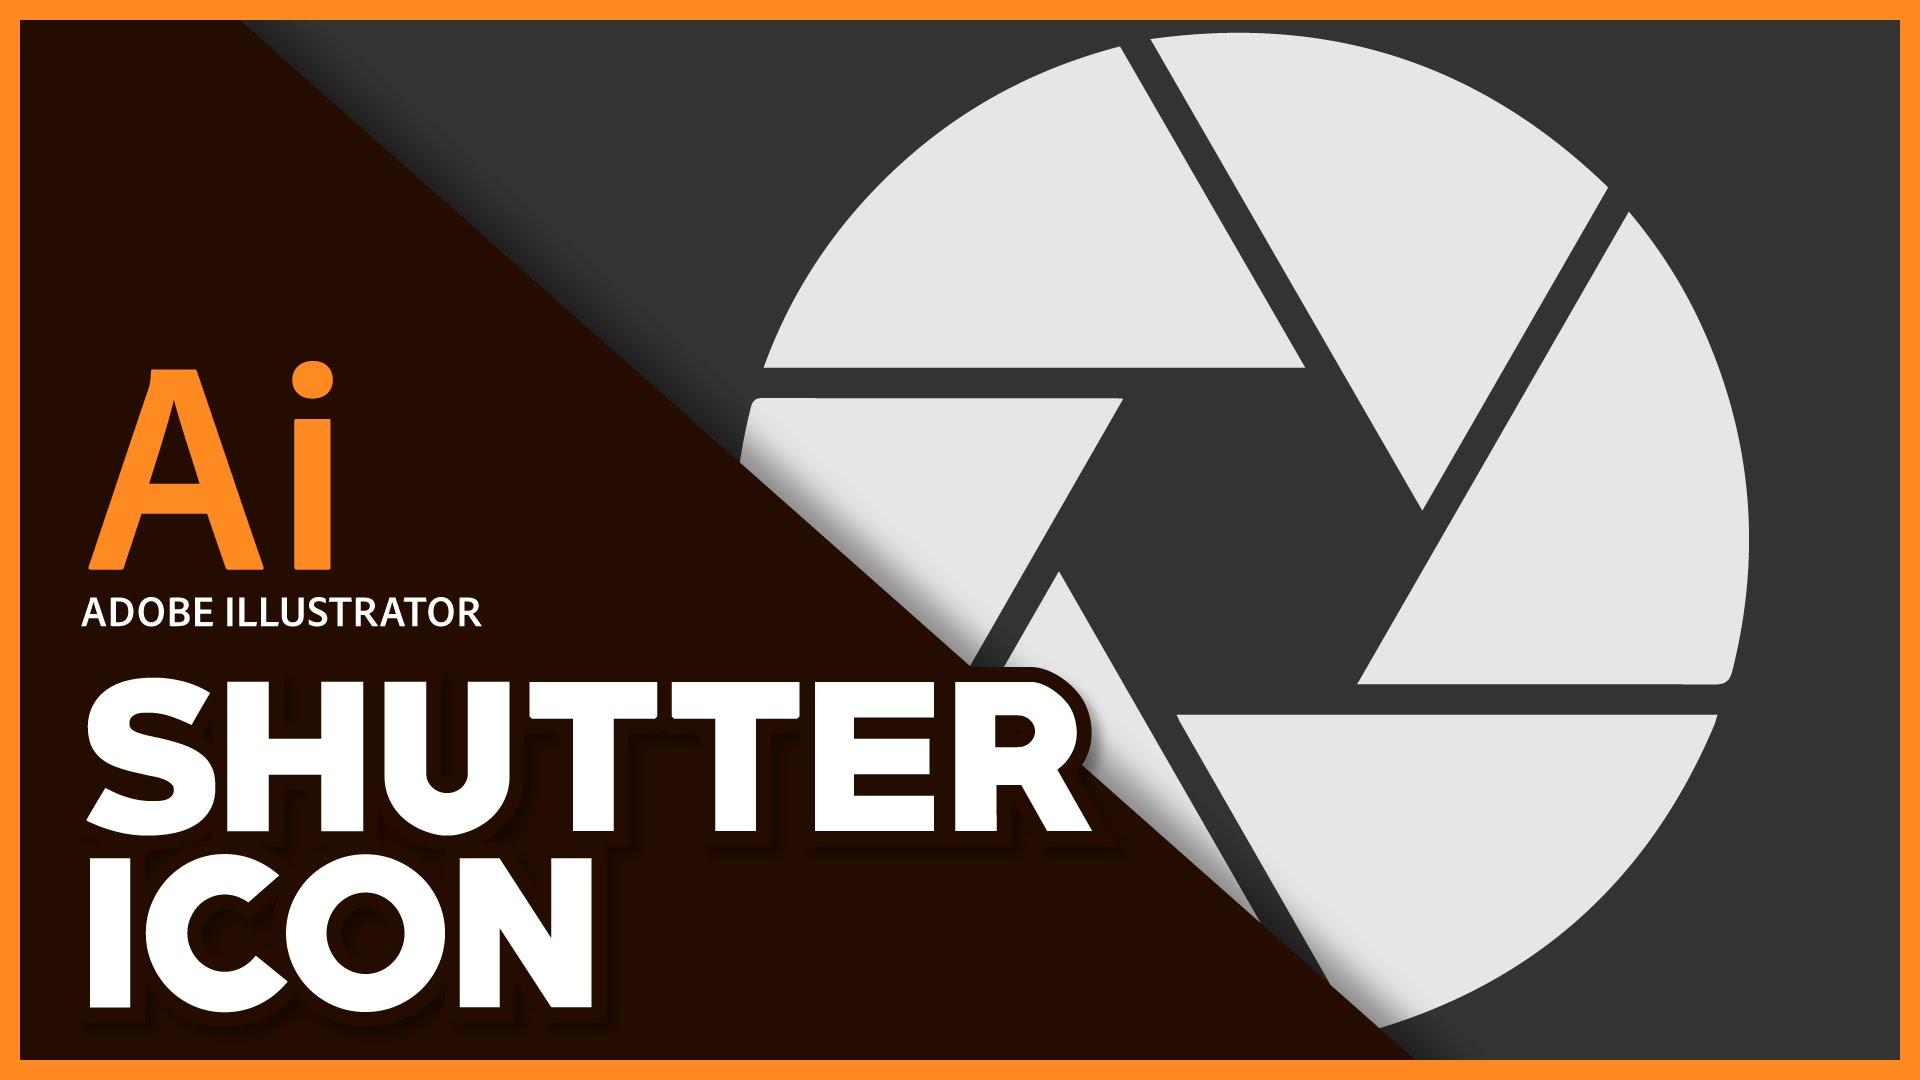 1920x1080 Adobe Illustrator Shutter Icon Tutorial